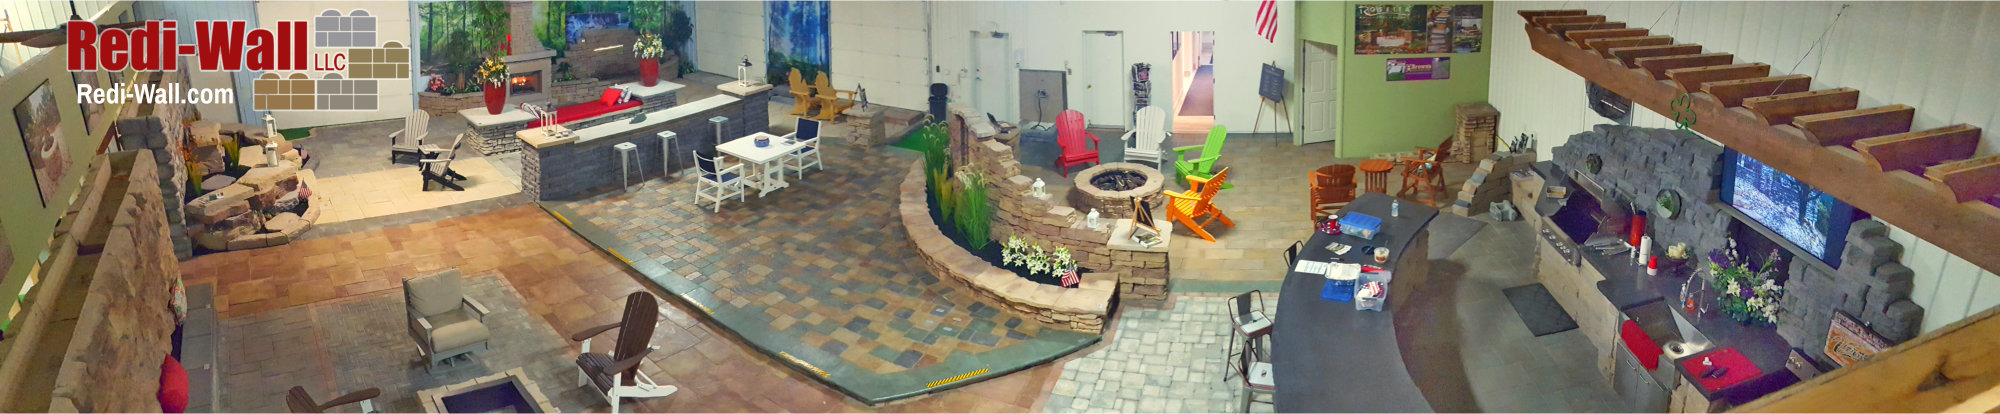 Redi-Wall_Indoor_Hardscape_Design_Center8